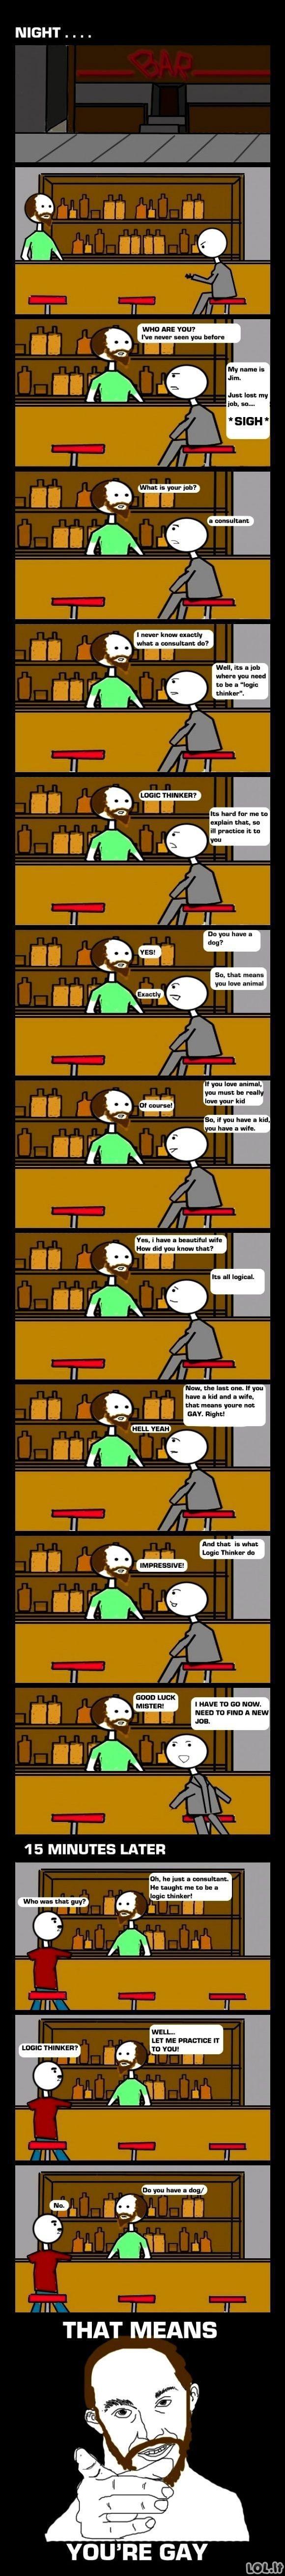 Pokalbis bare